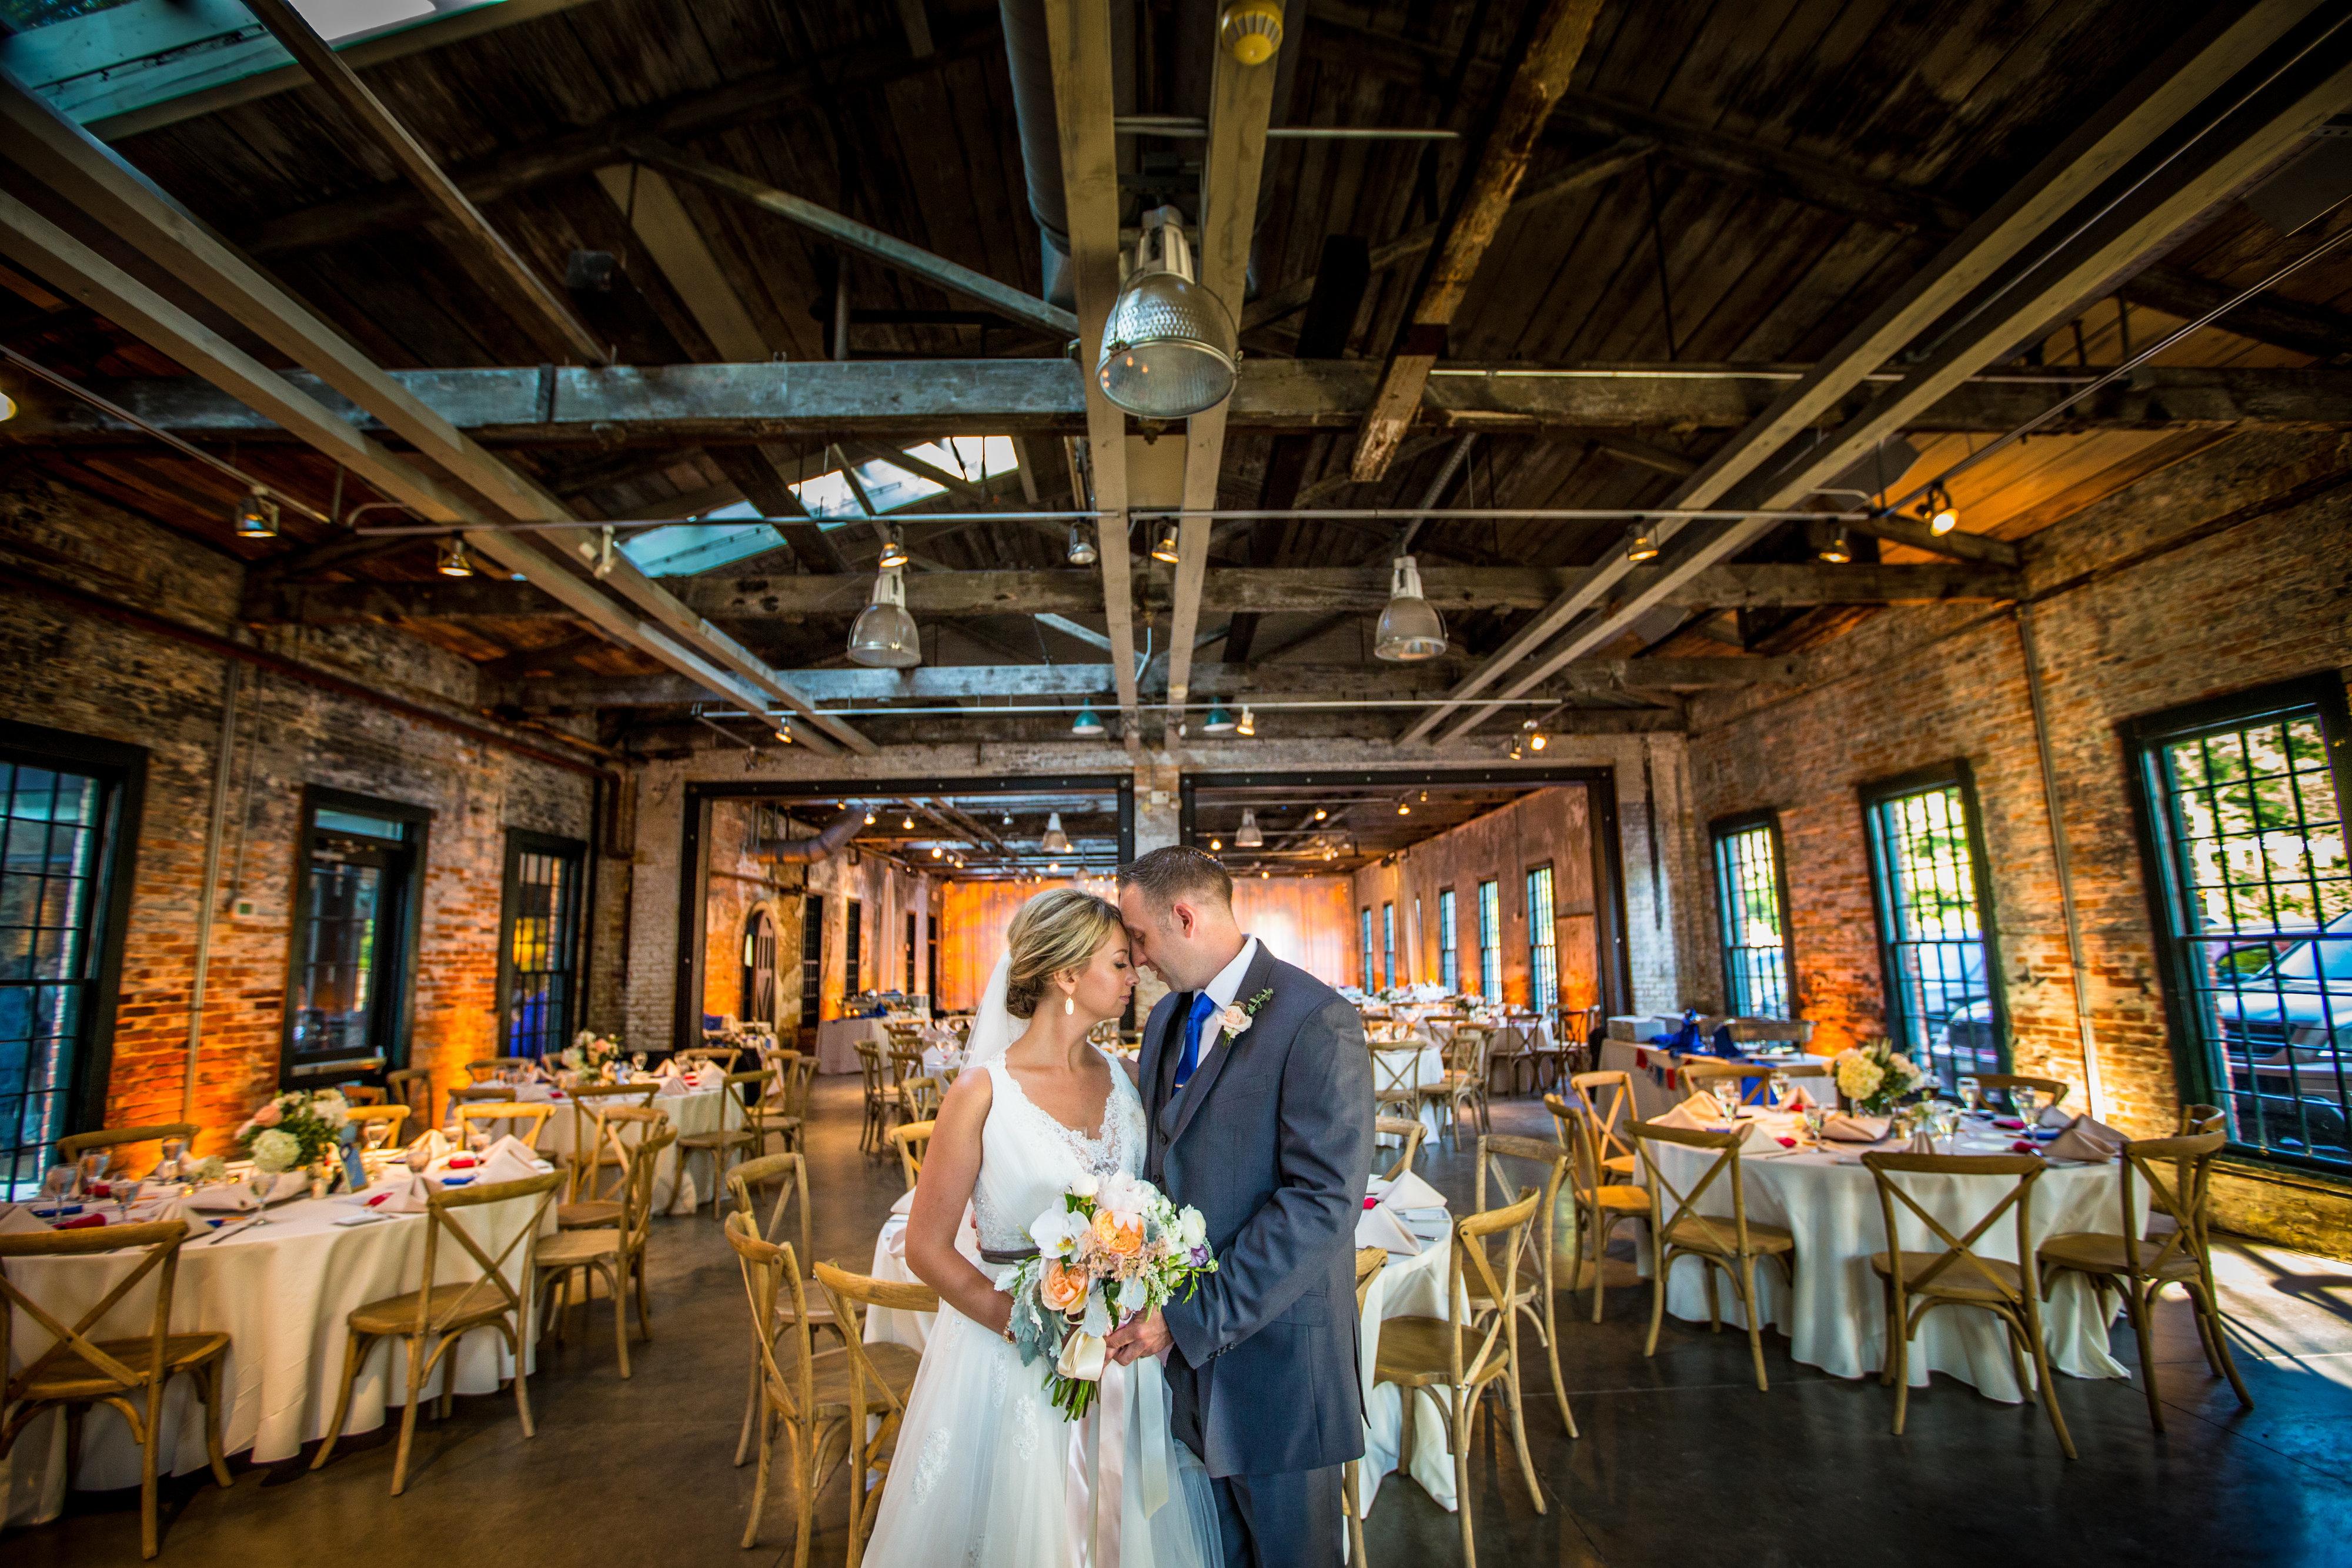 Mt Washington Mill Dye House Wedding Venue In Baltimore Partyspace